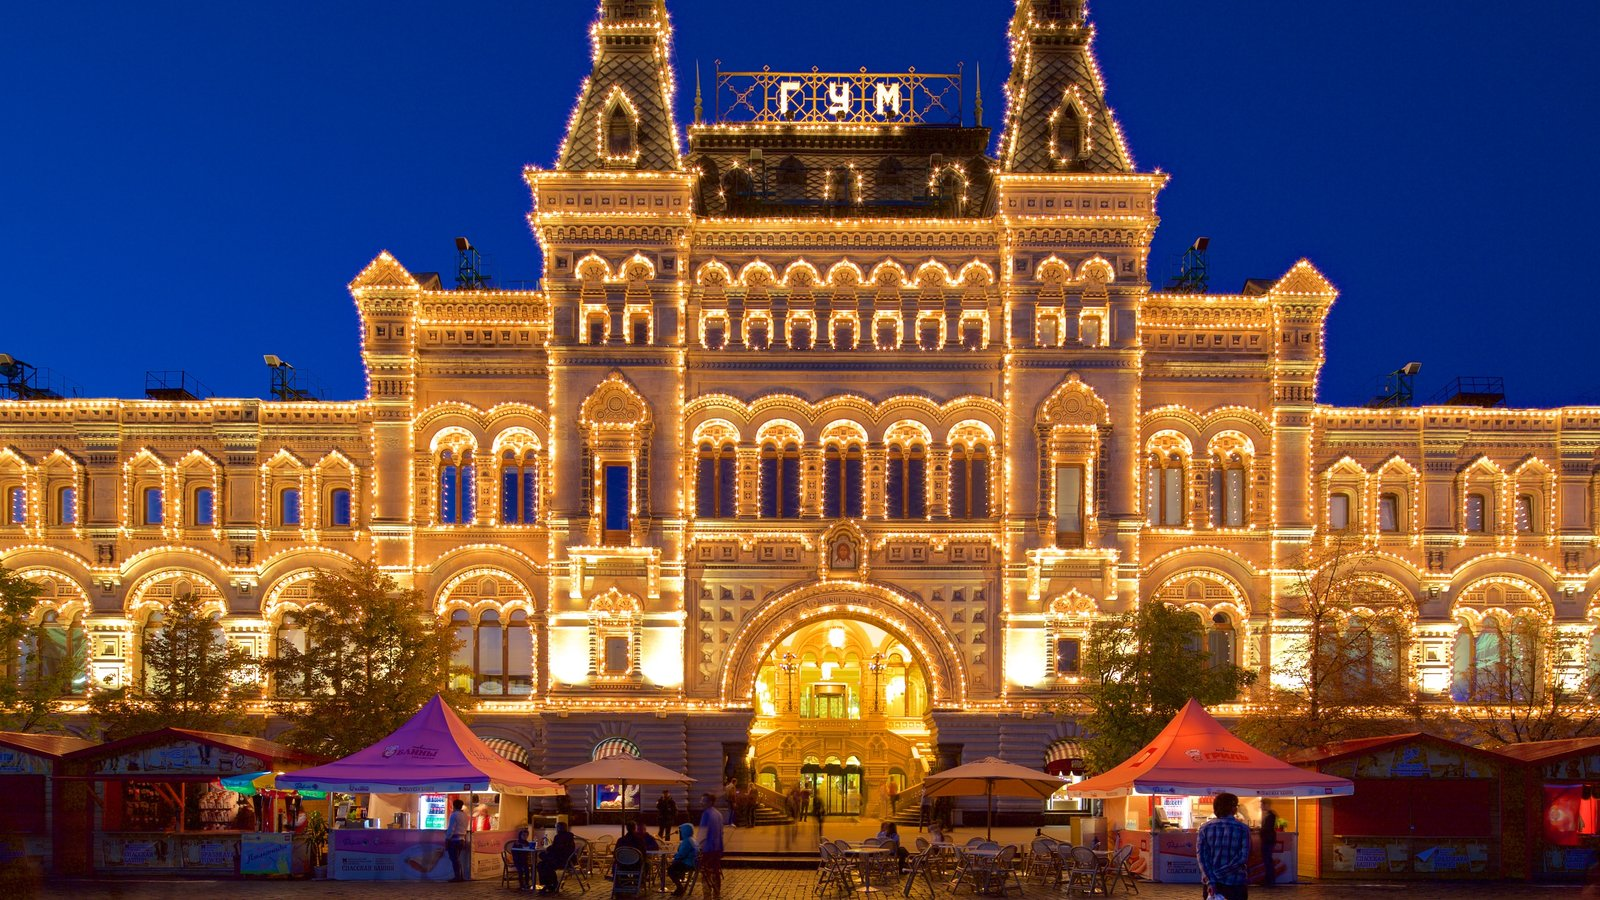 Kremlin que inclui arquitetura de patrimônio